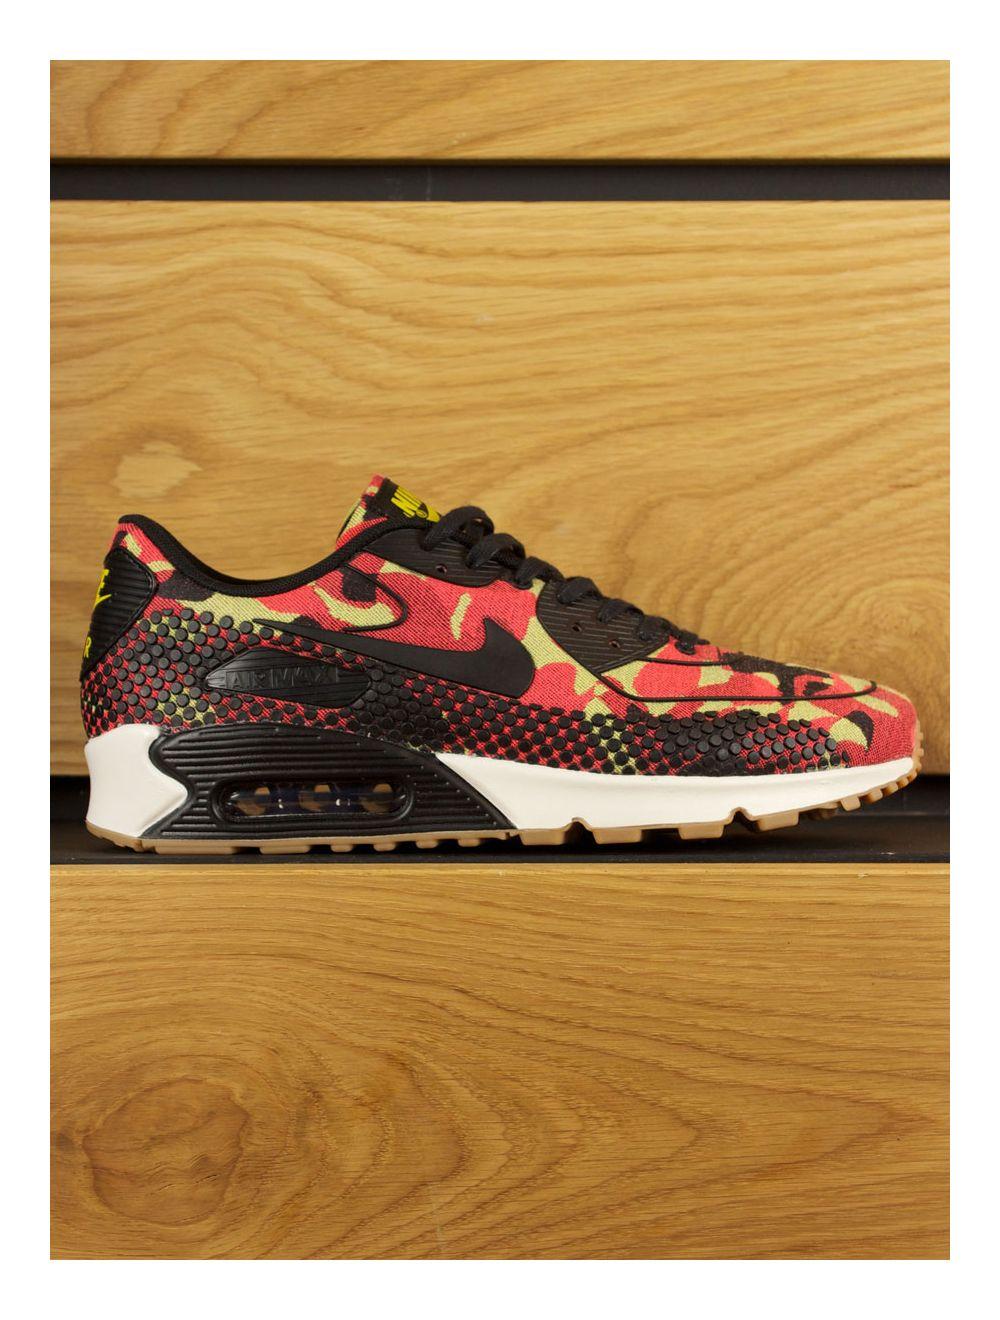 Nike Air Max 90 Jacquard Camo Premium